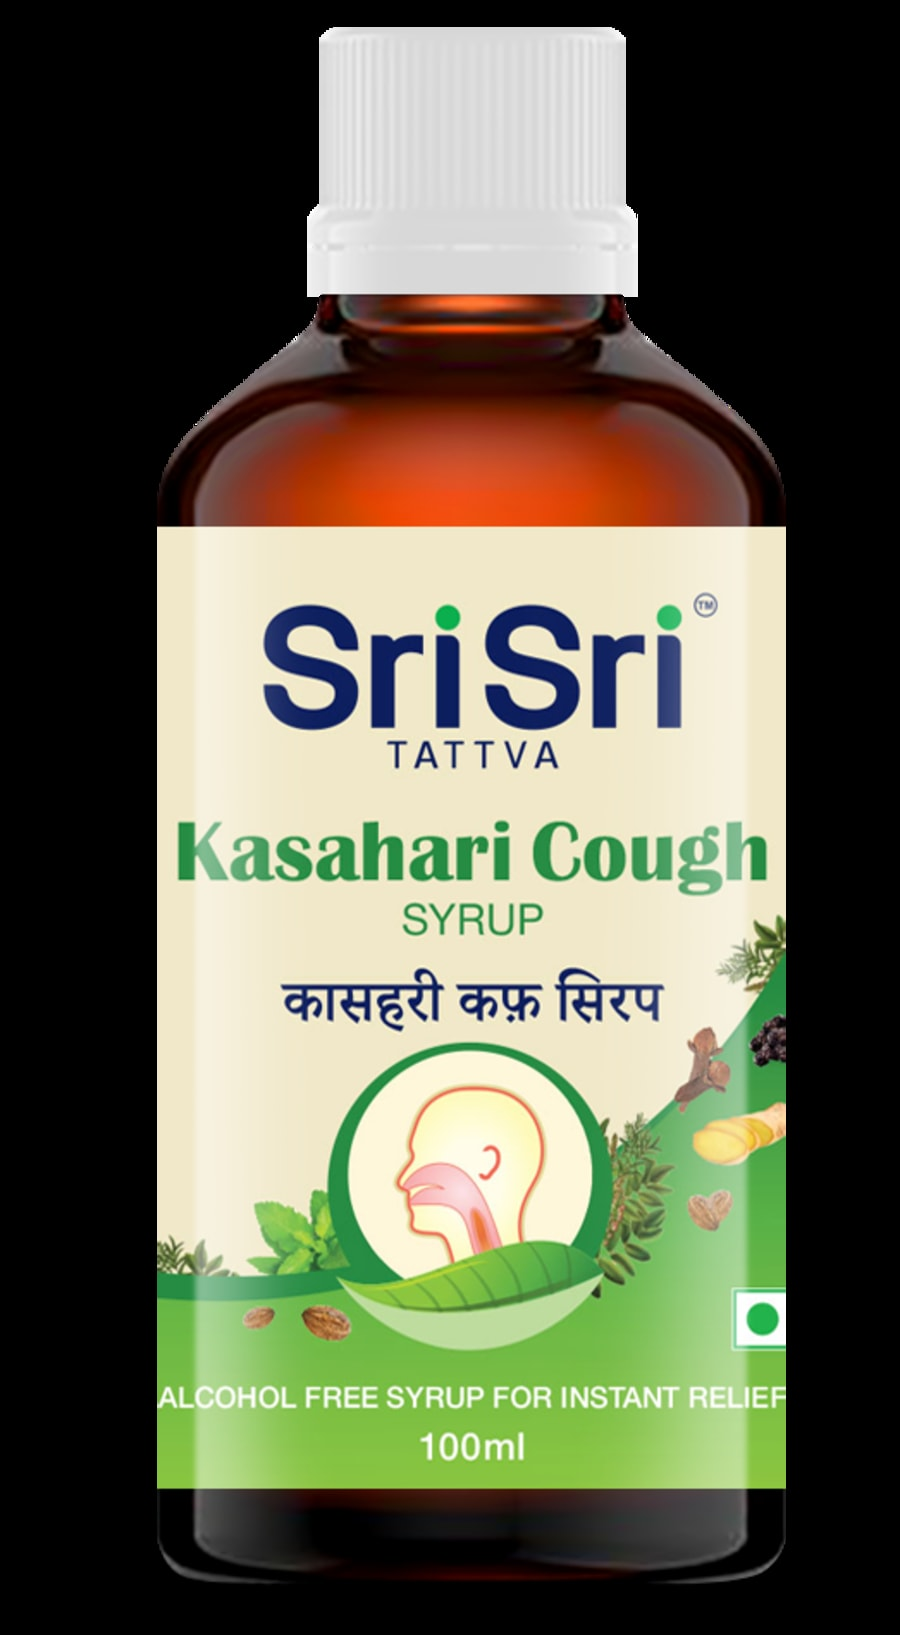 Sri Sri Tattva Kasahari Cough Syrup, 100ml